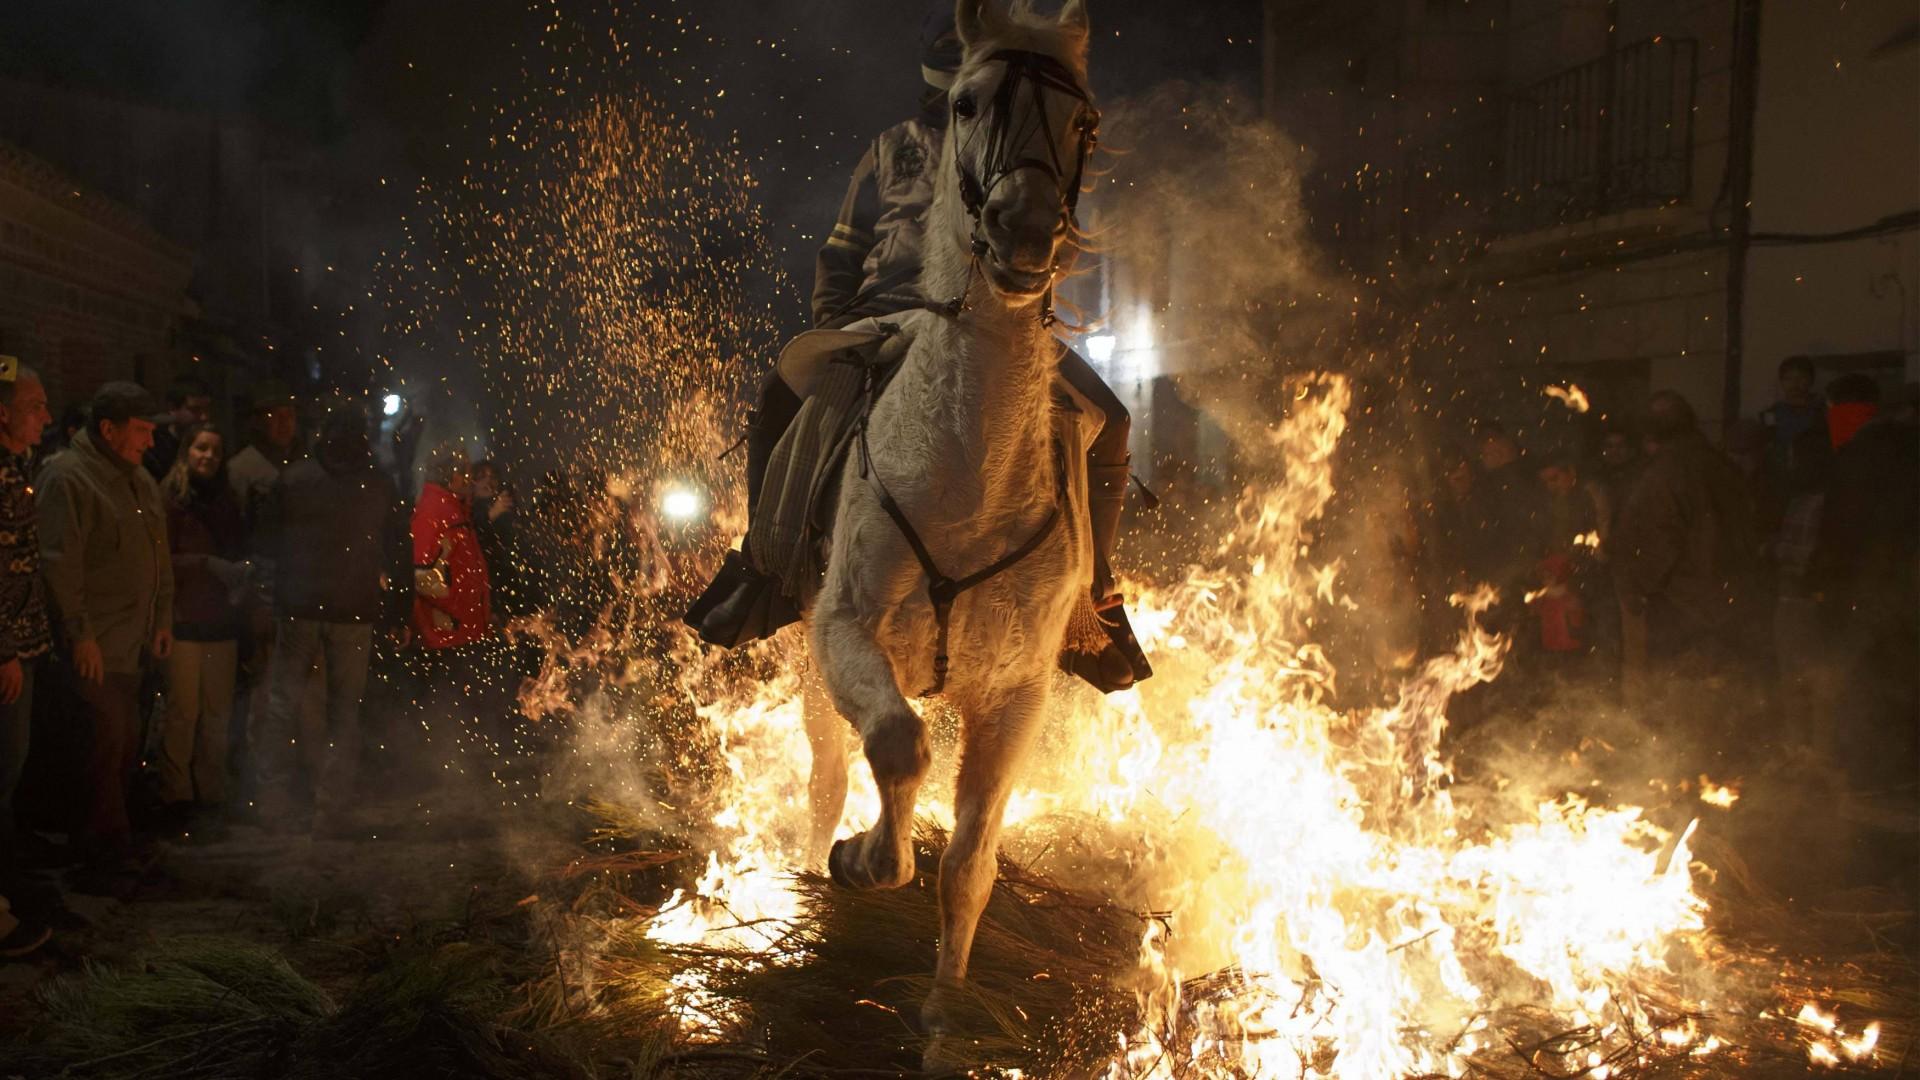 Апхелио, Шотландия, фестиваль, огонь, факельное шествие, викинги, Up-Helly-Аa, Scotland, festival, fire, torchlight procession, Vikings, event (horizontal)